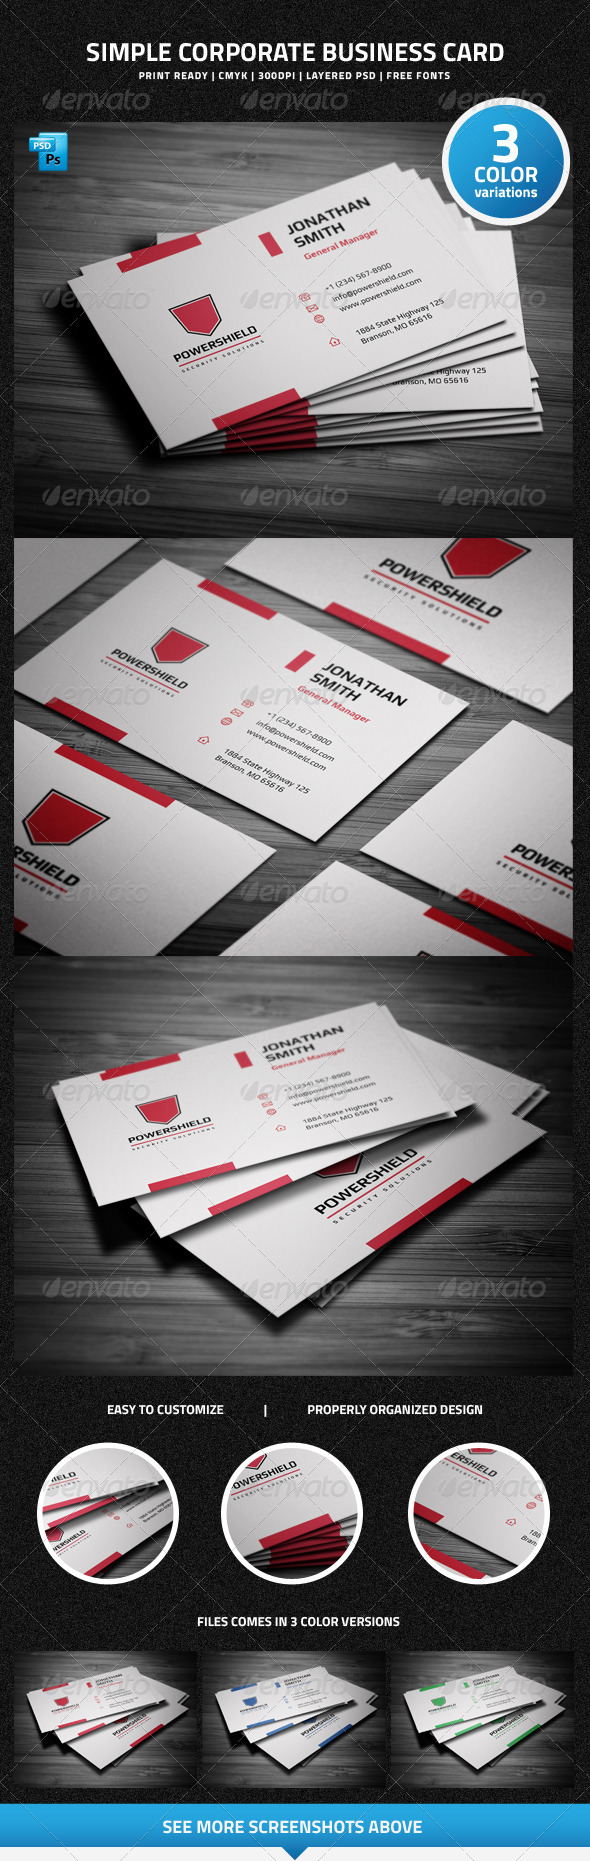 Simple Corporate Business Card - 21 - Corporate Business Cards